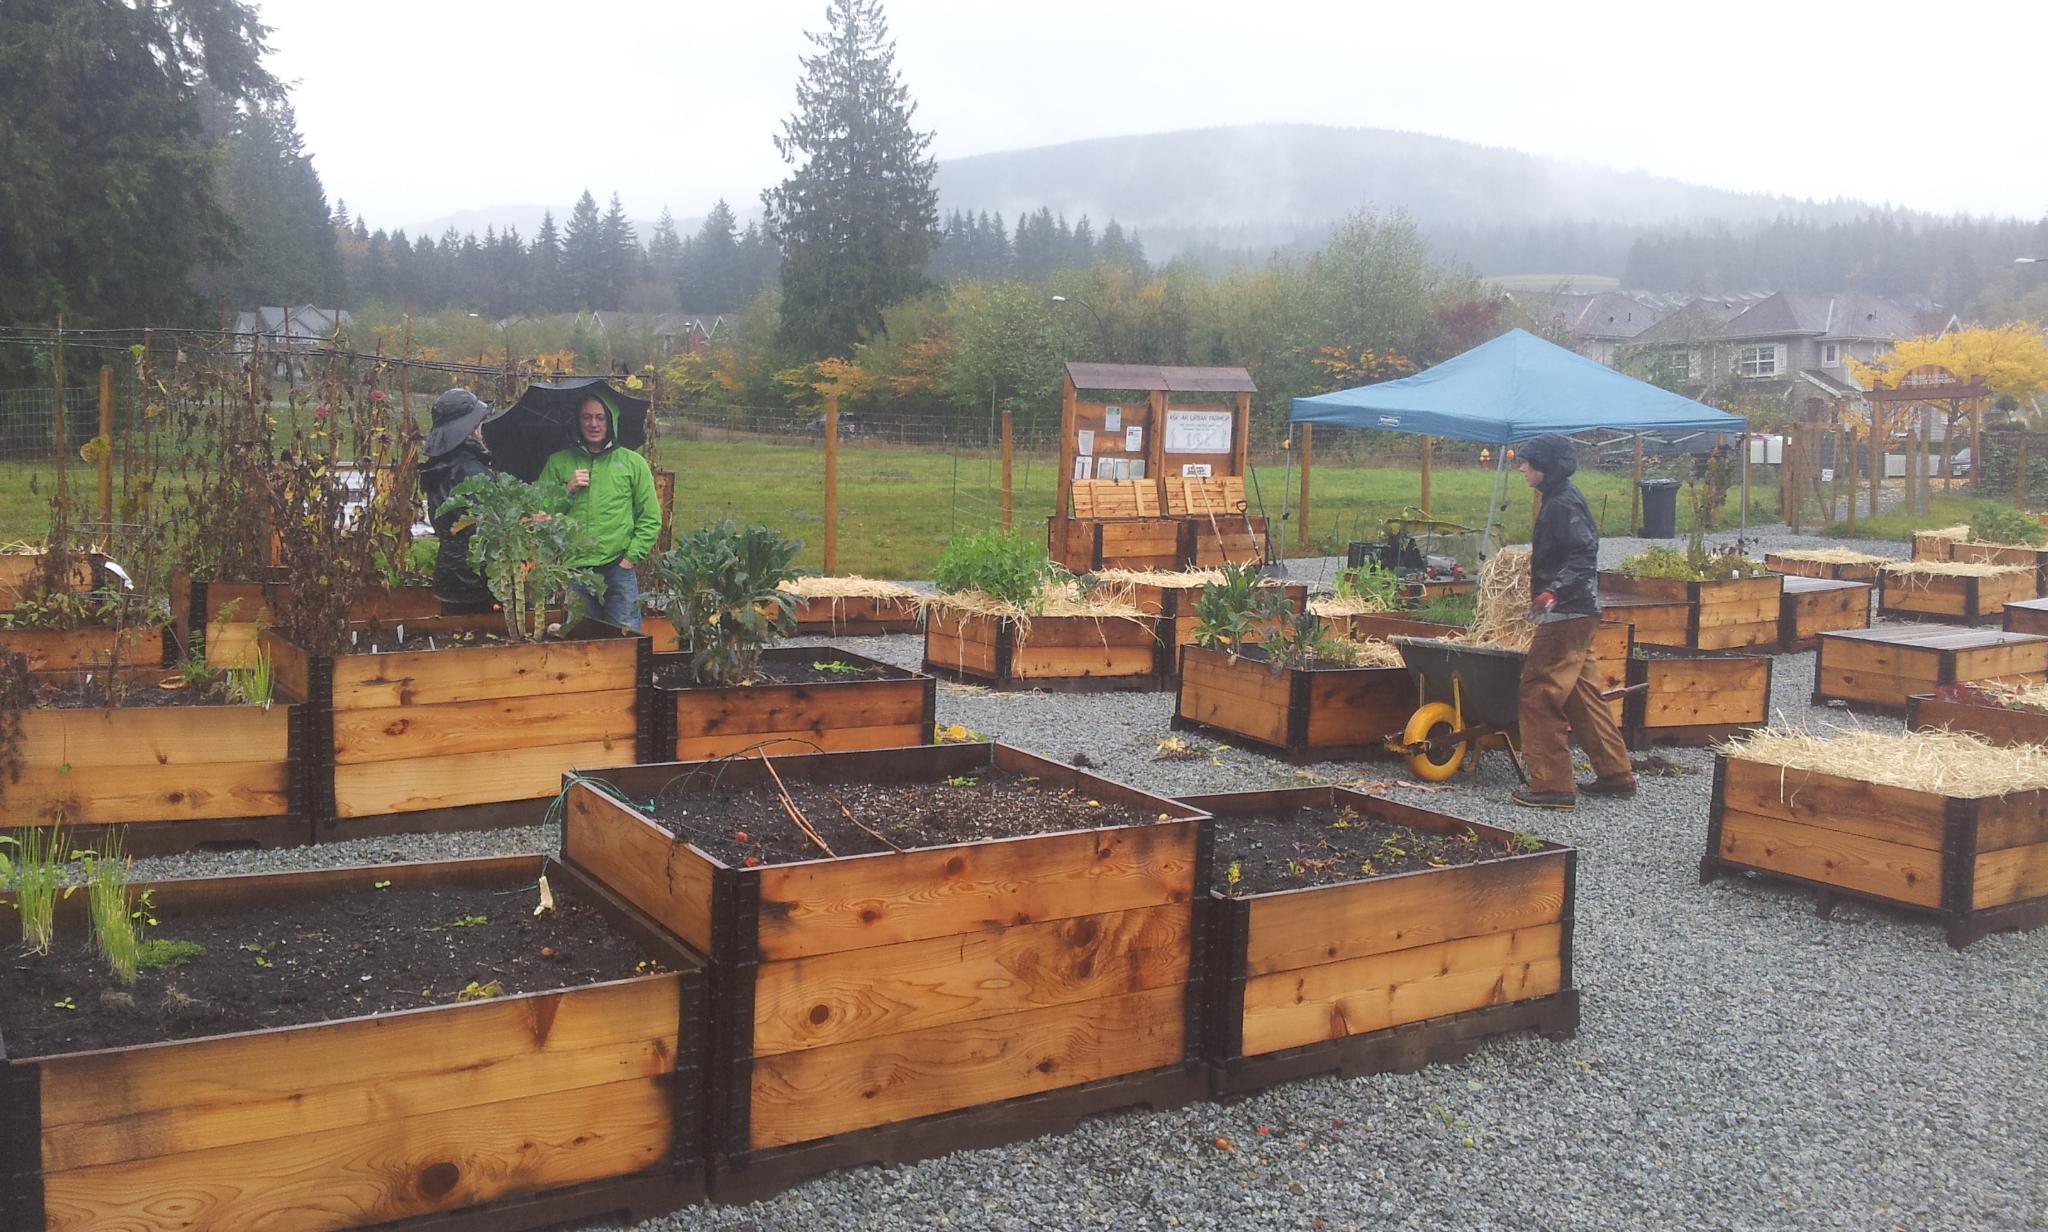 burke-mountain-temporary-community-garden-closing-112013_11244697923_o.jpg